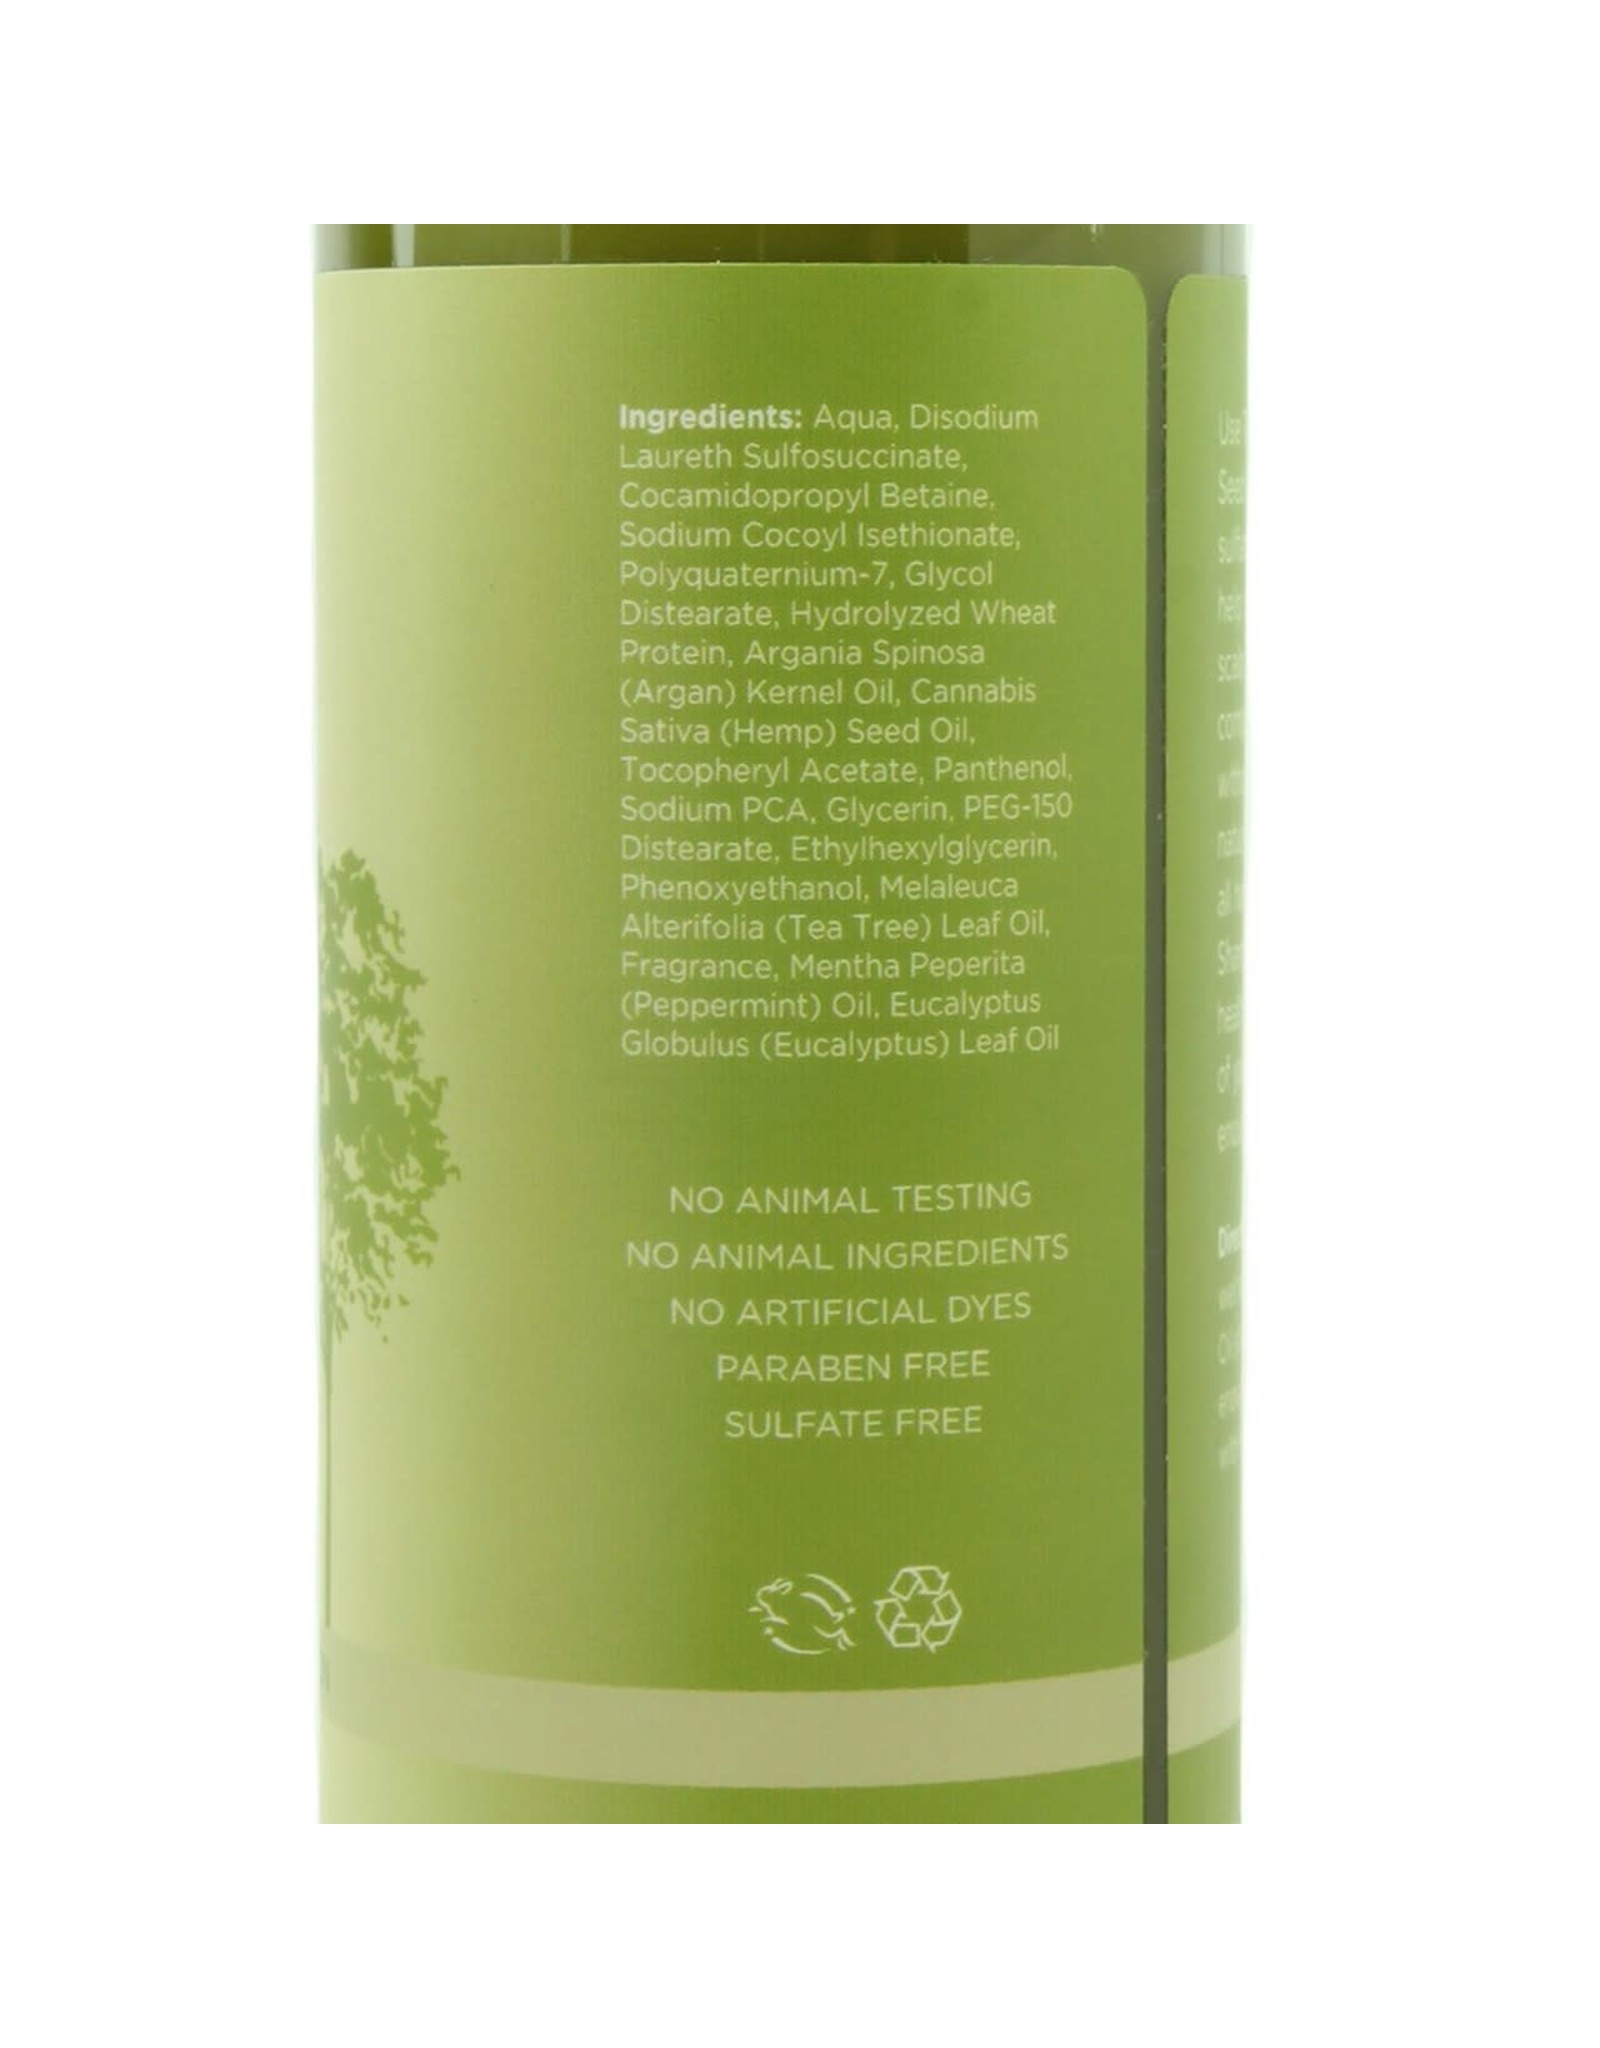 EARTHLY BODY EARTHLY BODY - MIRACLE OIL TEA TREE SHAMPOO - 16OZ